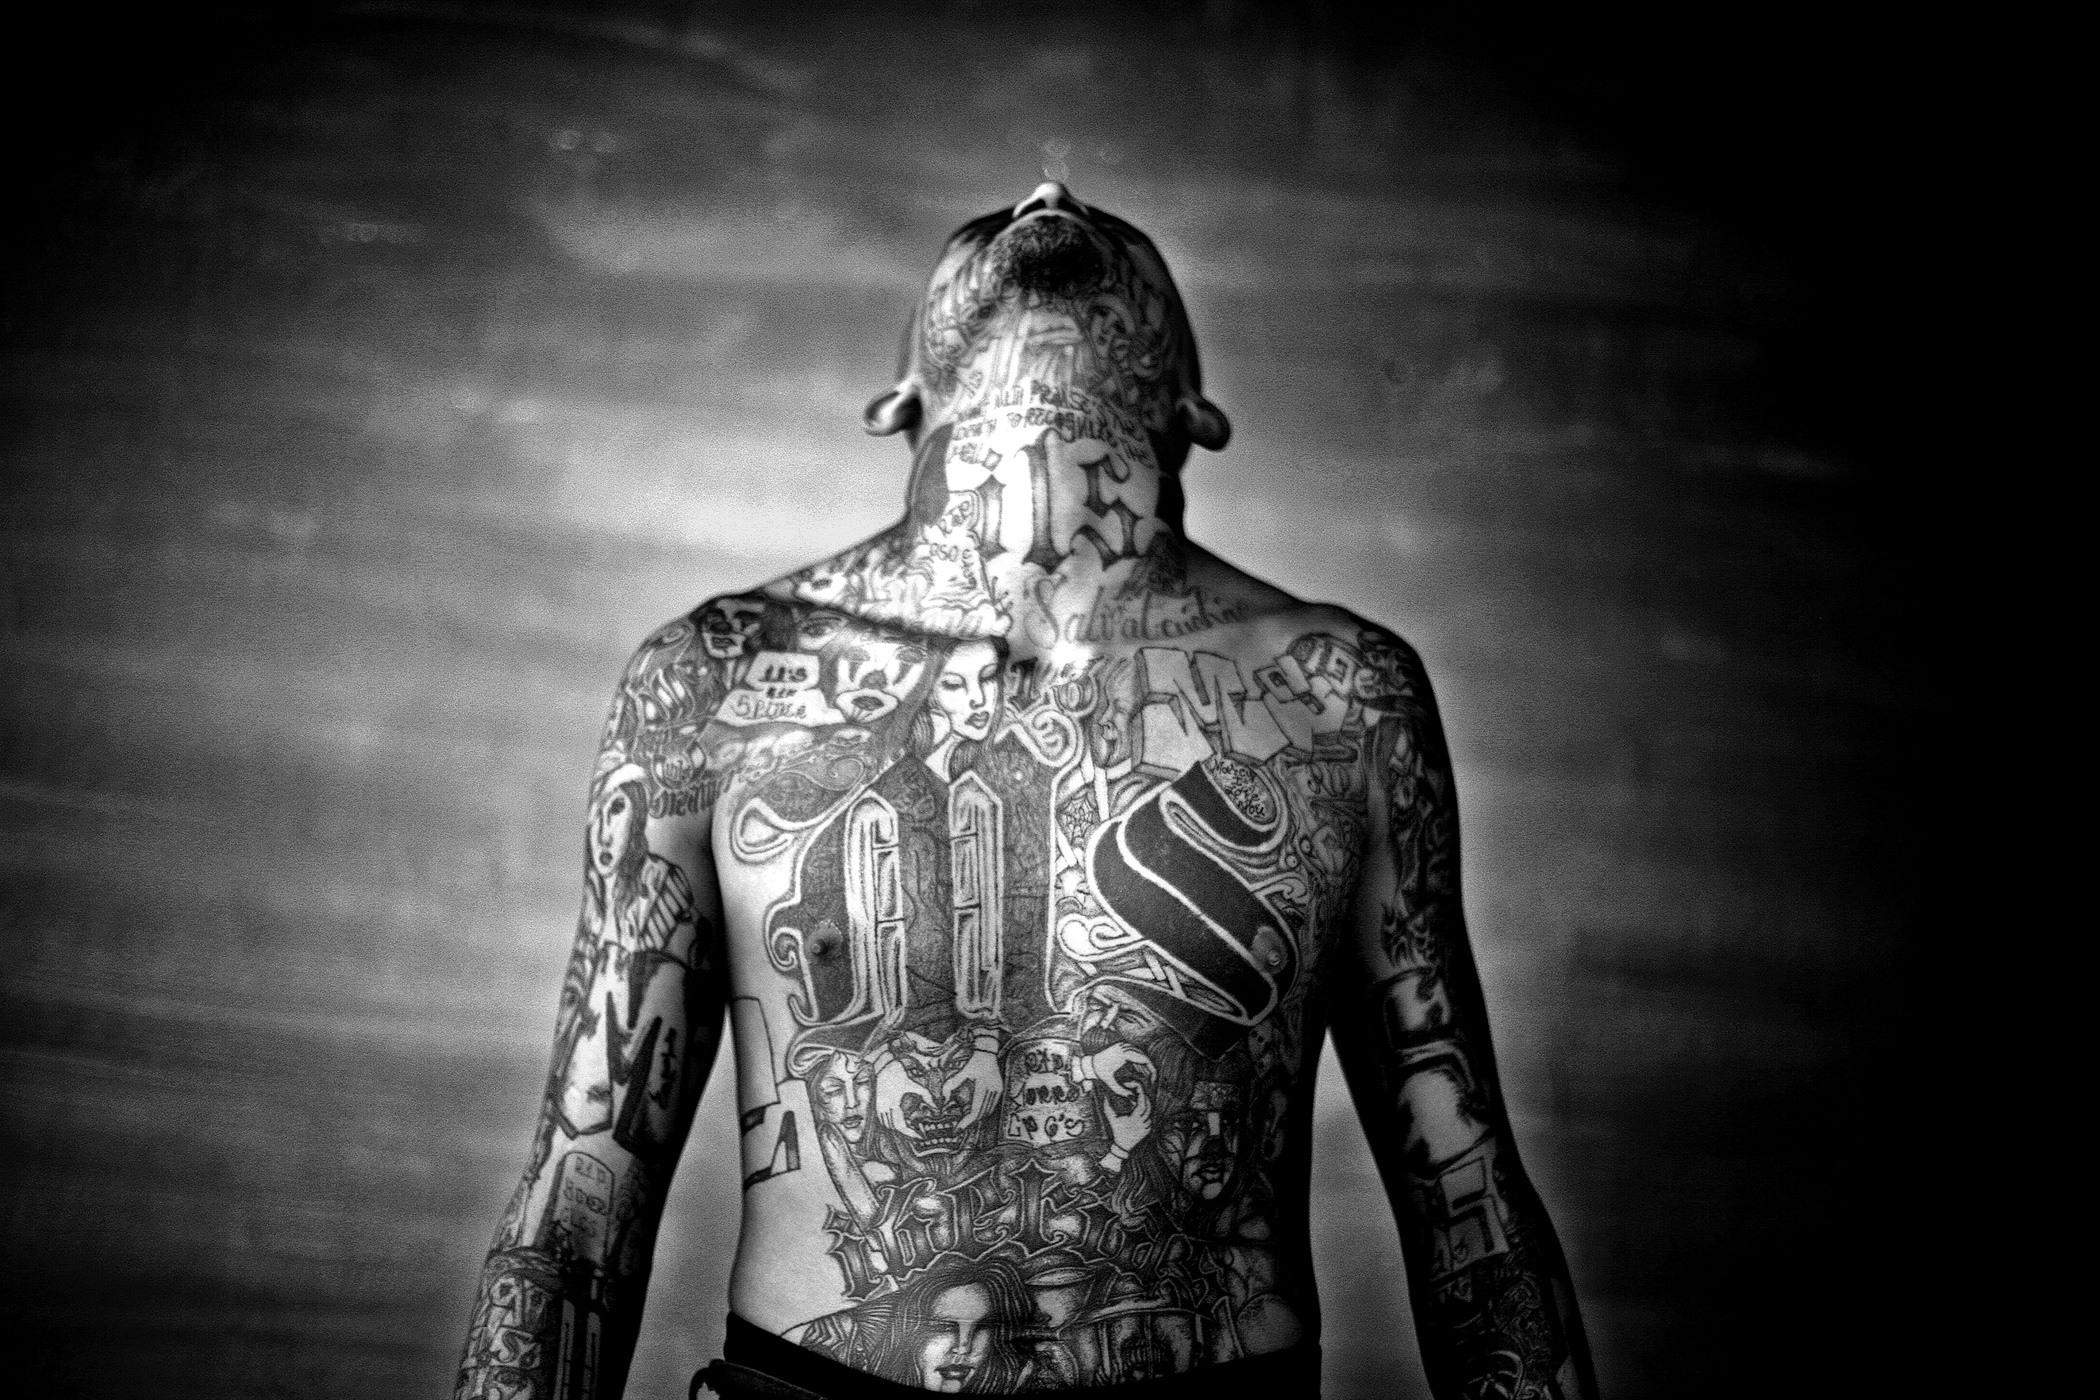 Chelatenango, El Salvador. May 2007. A members of the Mara Salvatrucha gang displays his tattoos inside the Chelatenango prison in El Salvador.